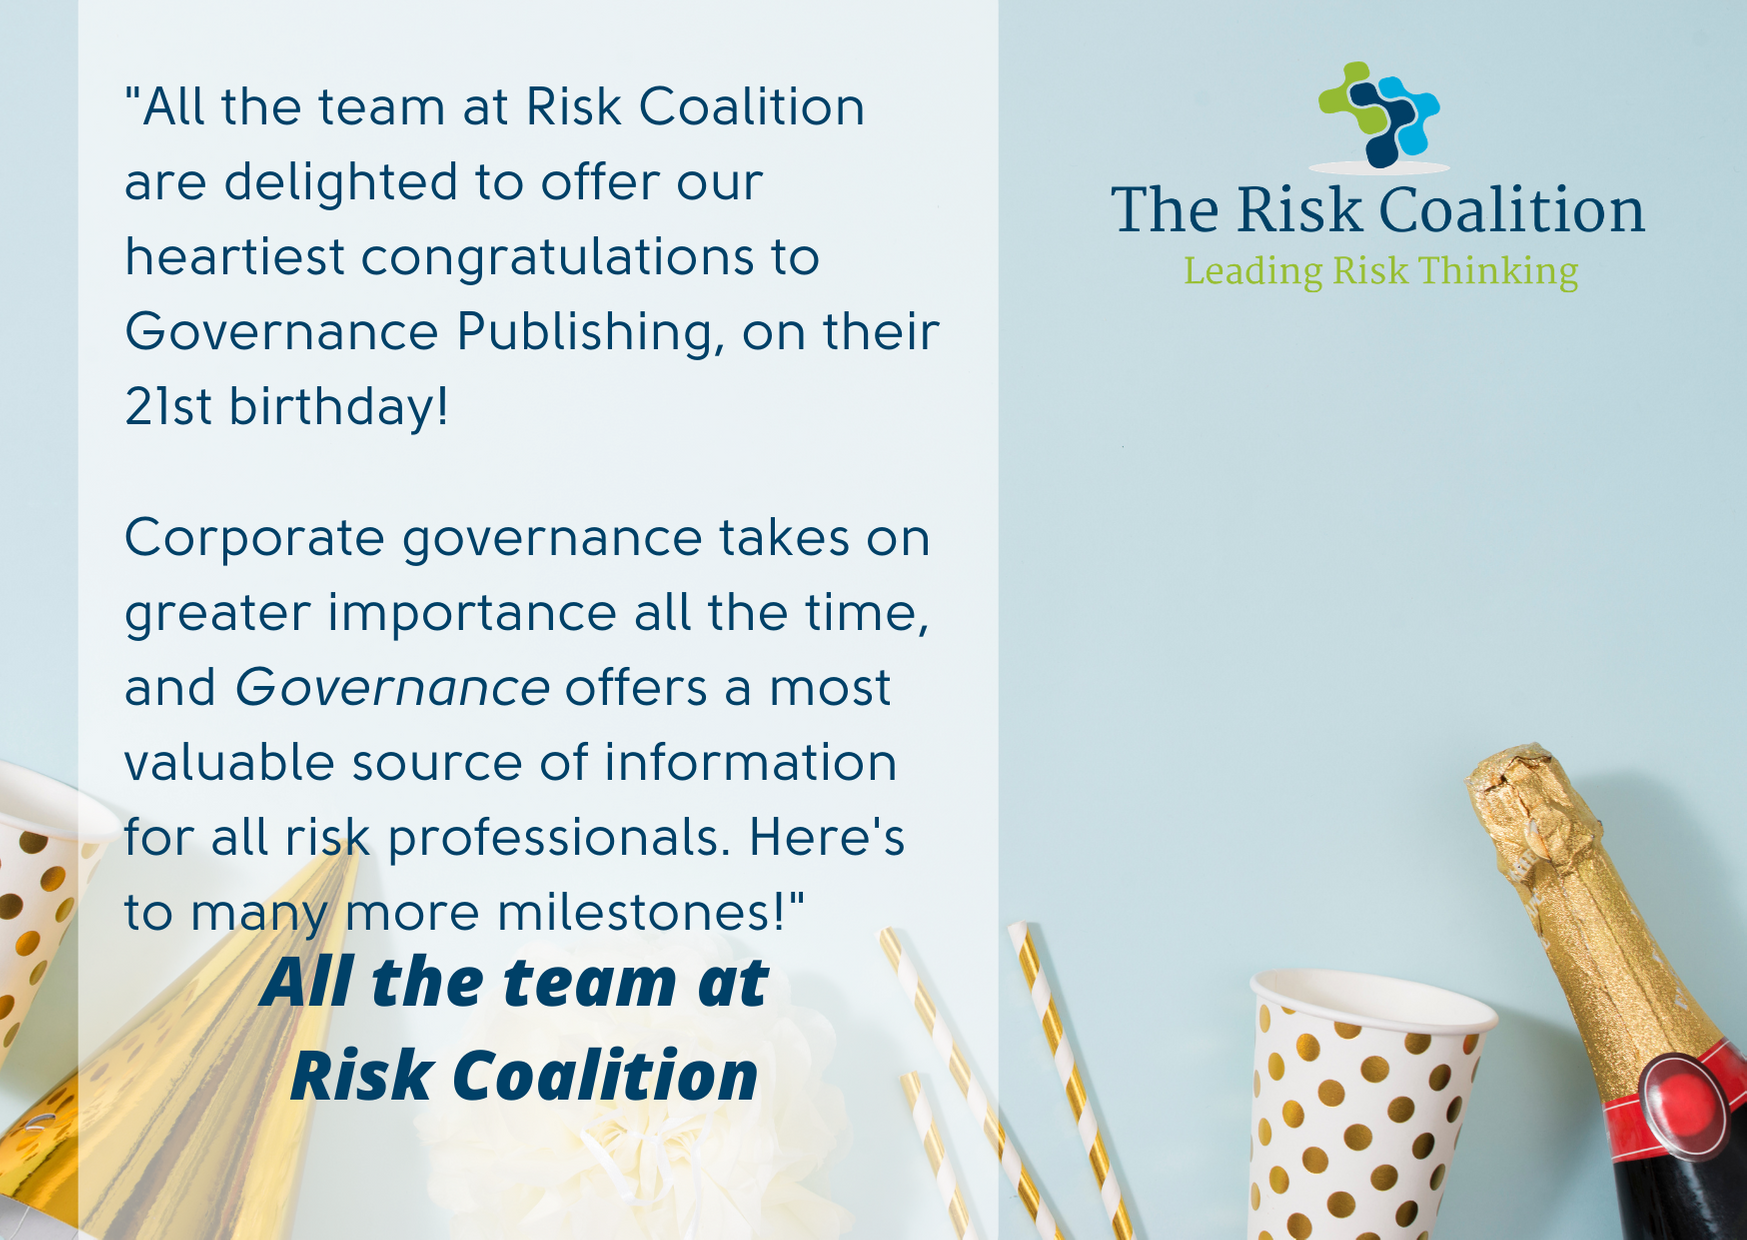 Risk Coalition